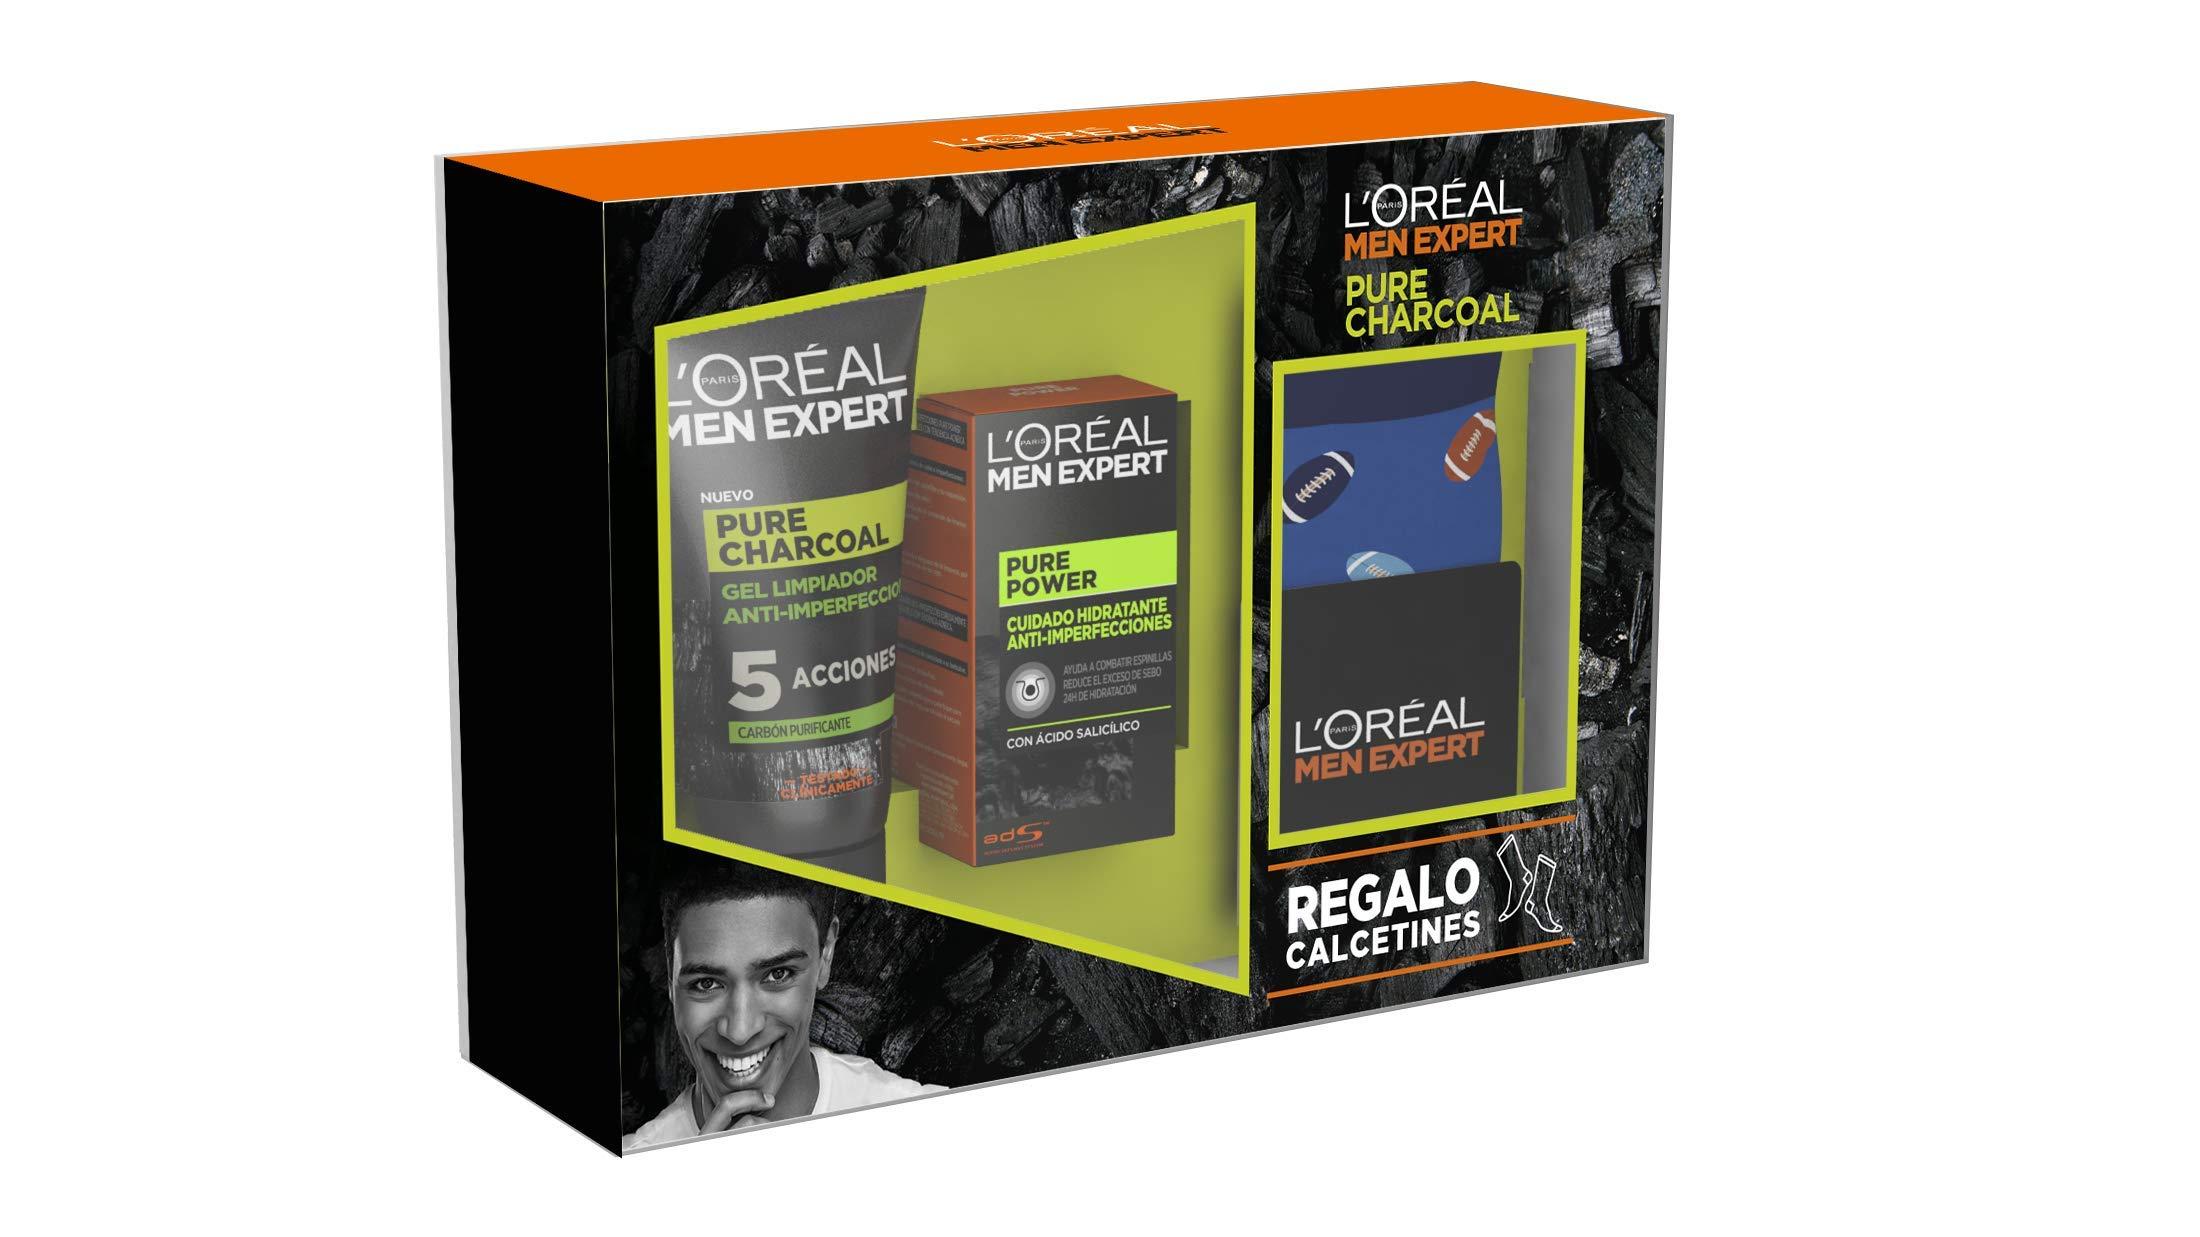 L'Oréal Men Expert – Pack con Crema hidratante Pure Power 50 ml y Limpiador Pure Charcoal 100 ml